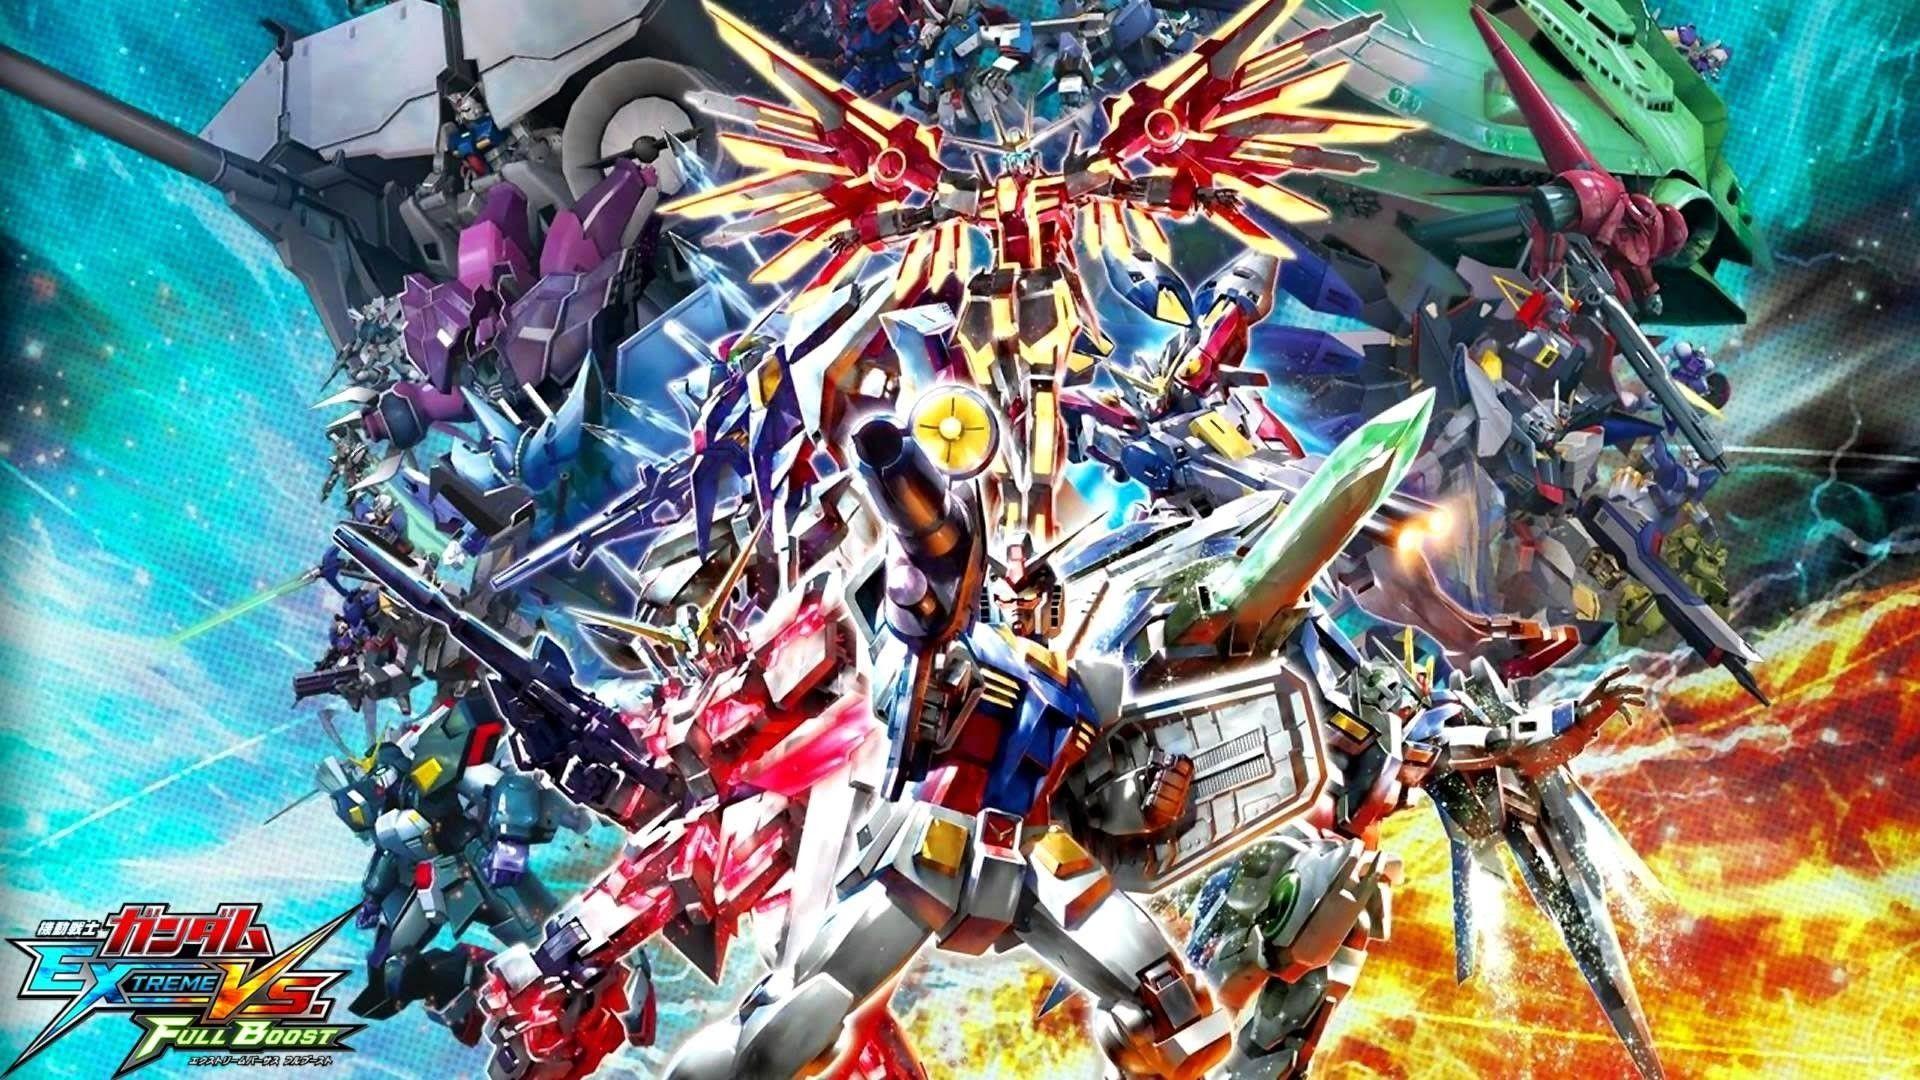 Gundam Wallpaper For Desktop Best Wallpaper Hd Yugioh Dragons Galaxy Eyes Gundam Wallpapers